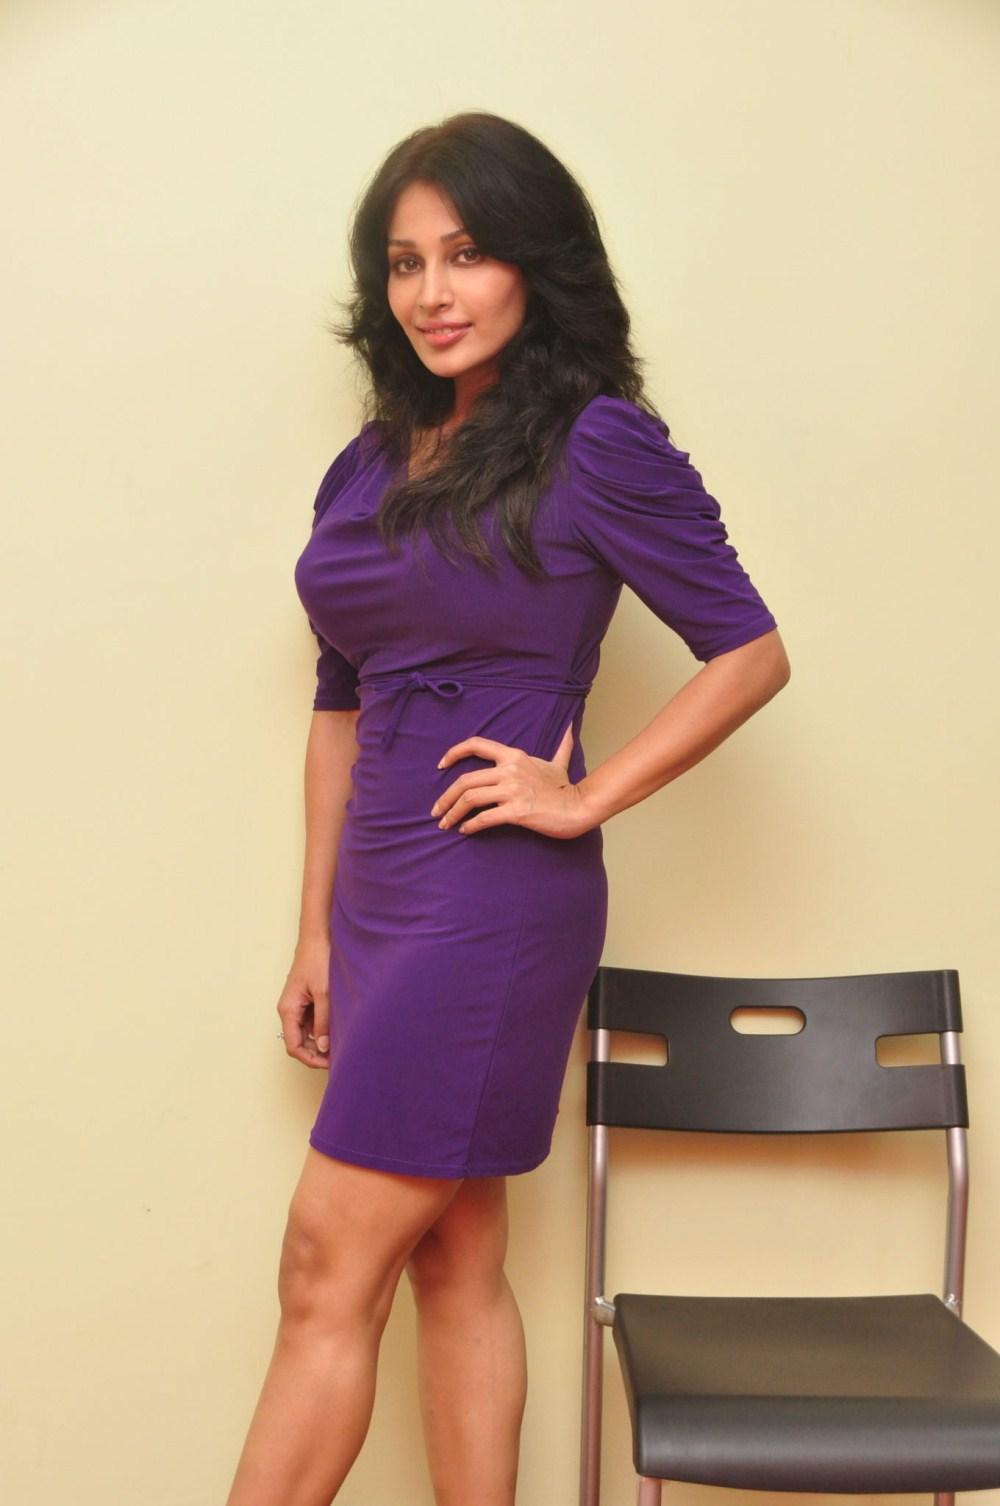 Asha Saini Age, Weight, Height, Body ... - The Star Info